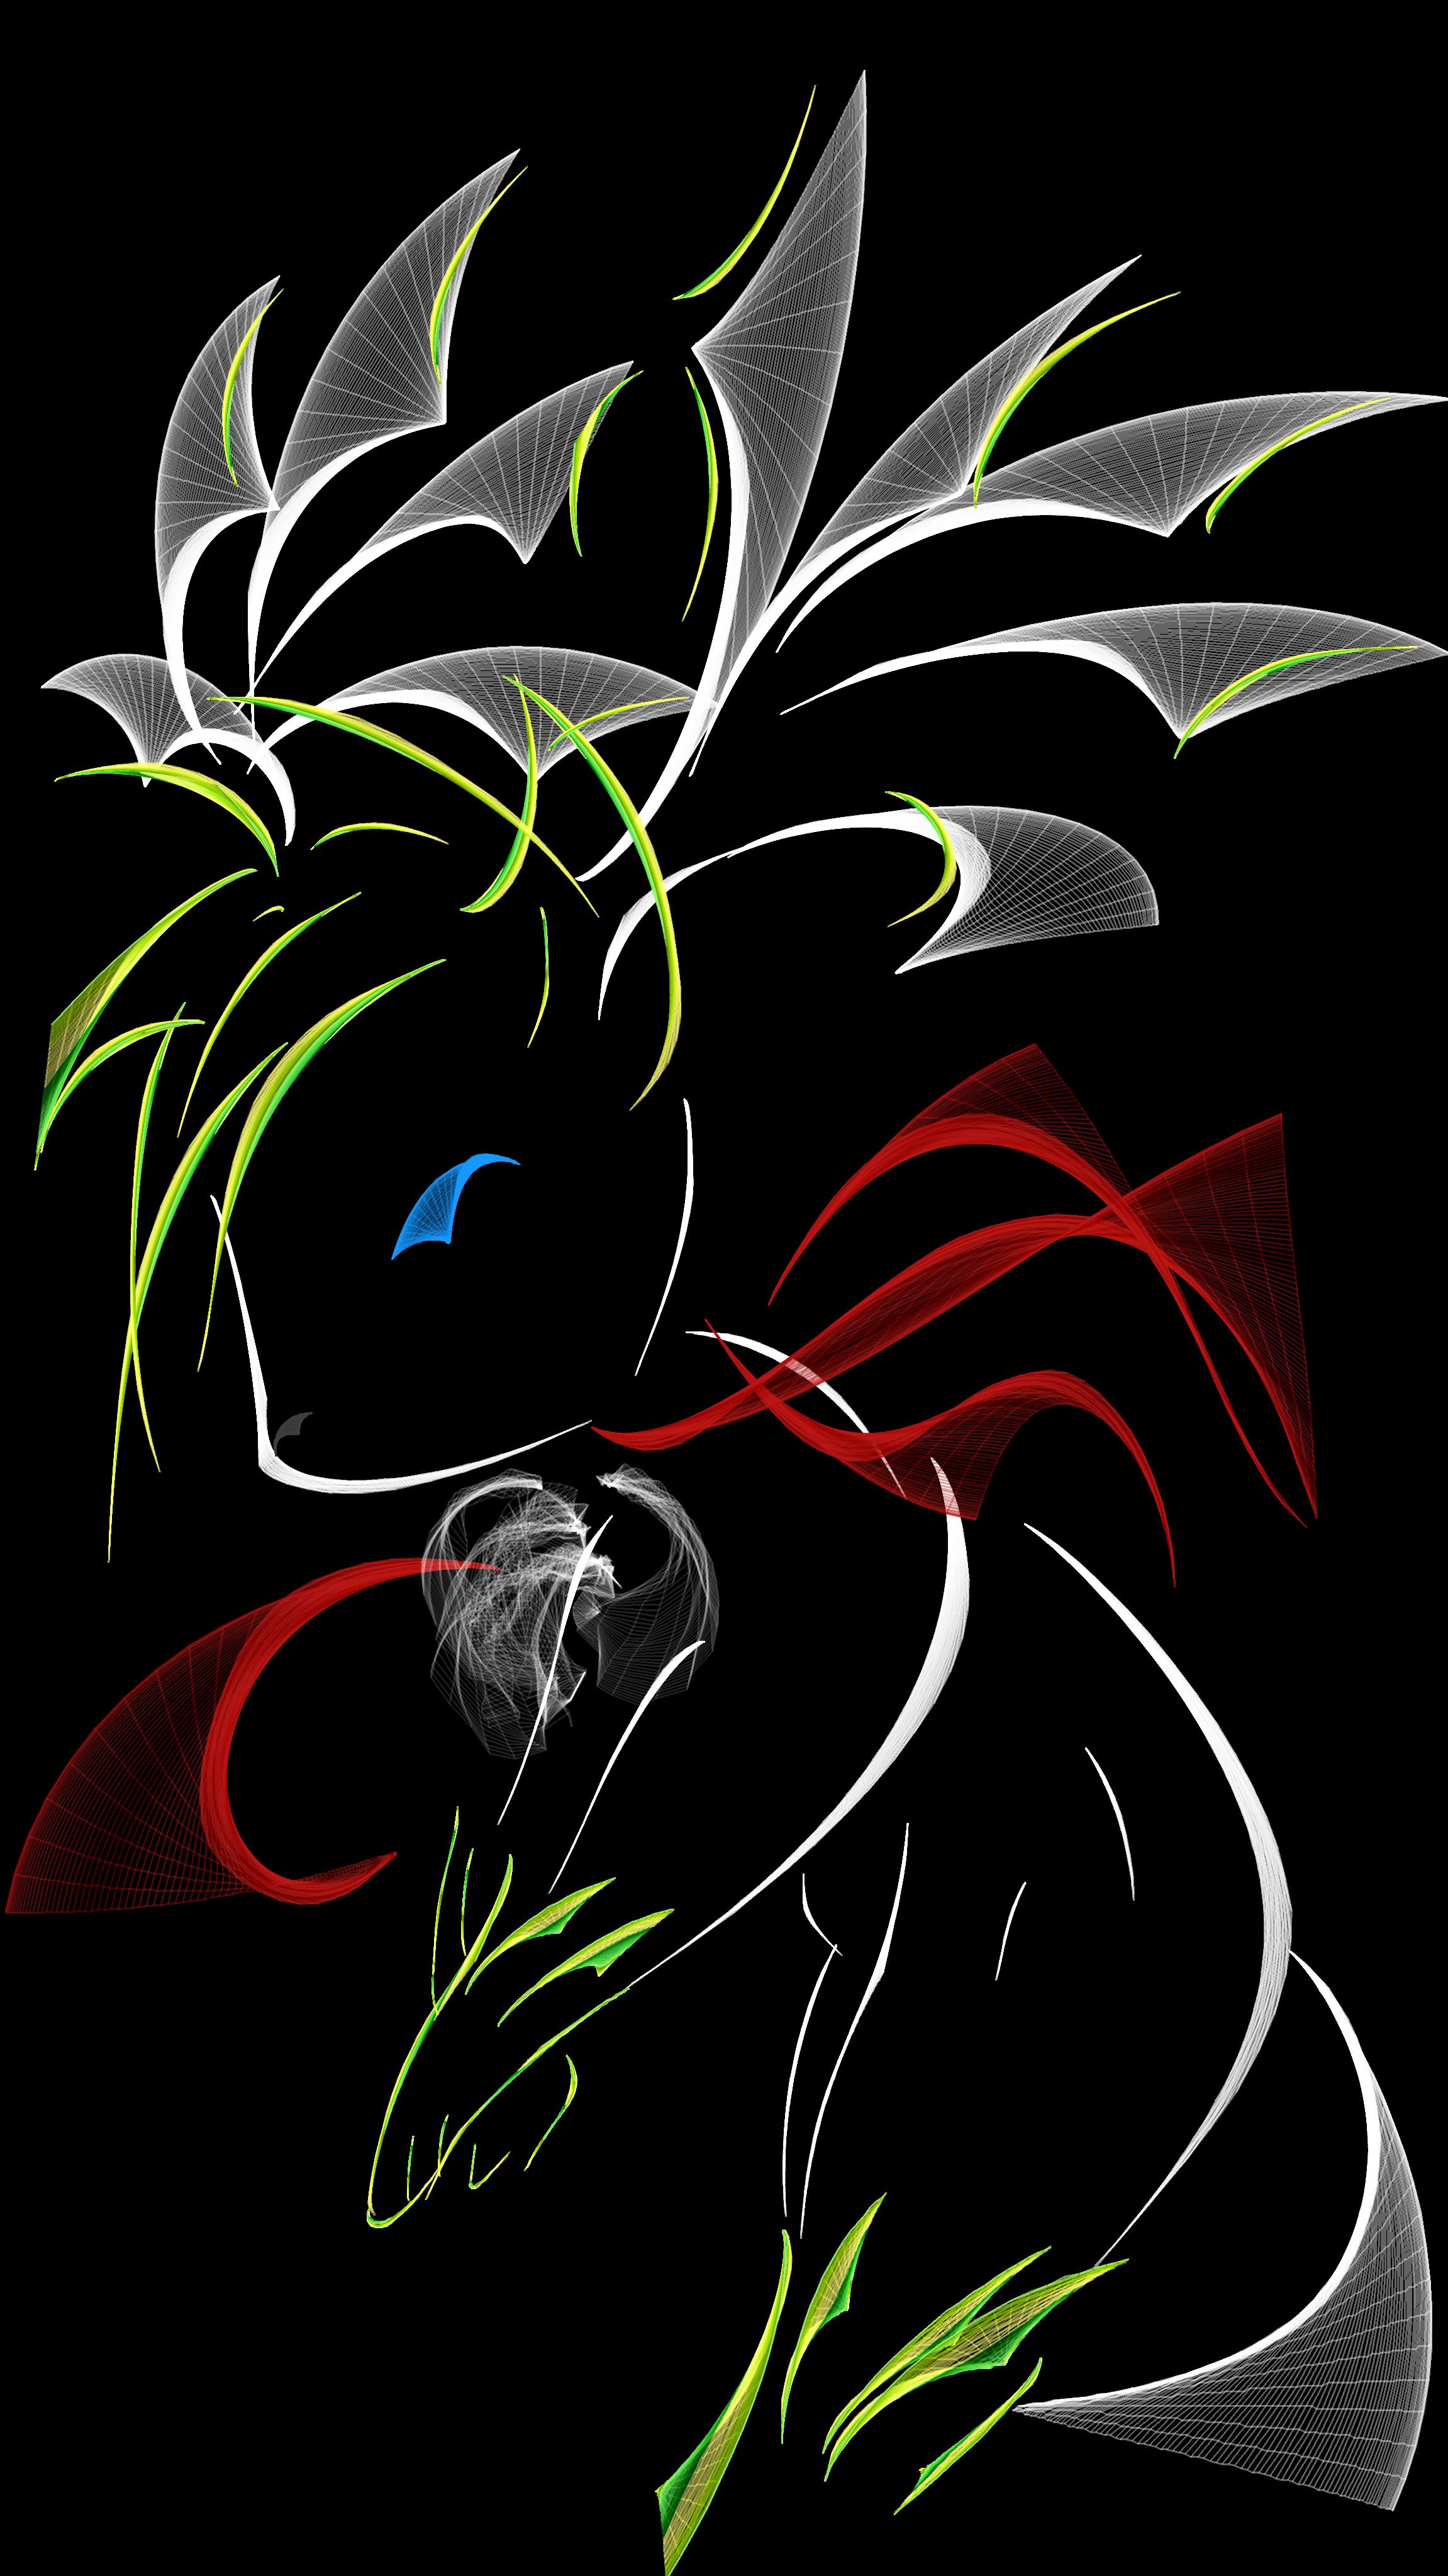 Flowpaperでスカイフォルムシェイミ Shaymin My Flowpaper Pokemon